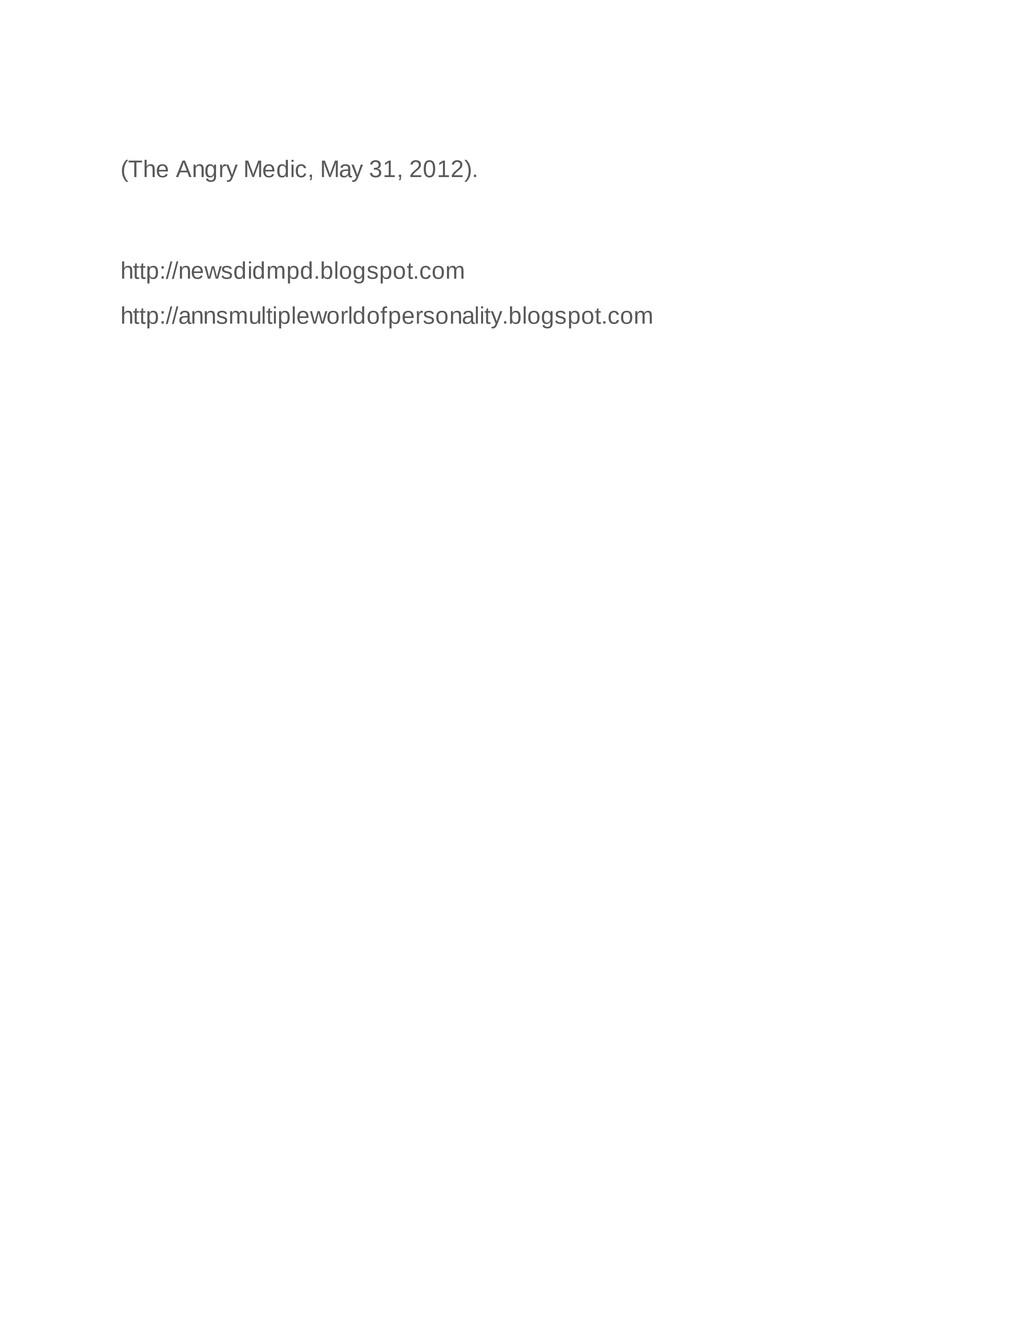 (The Angry Medic, May 31, 2012). http://newsdid...